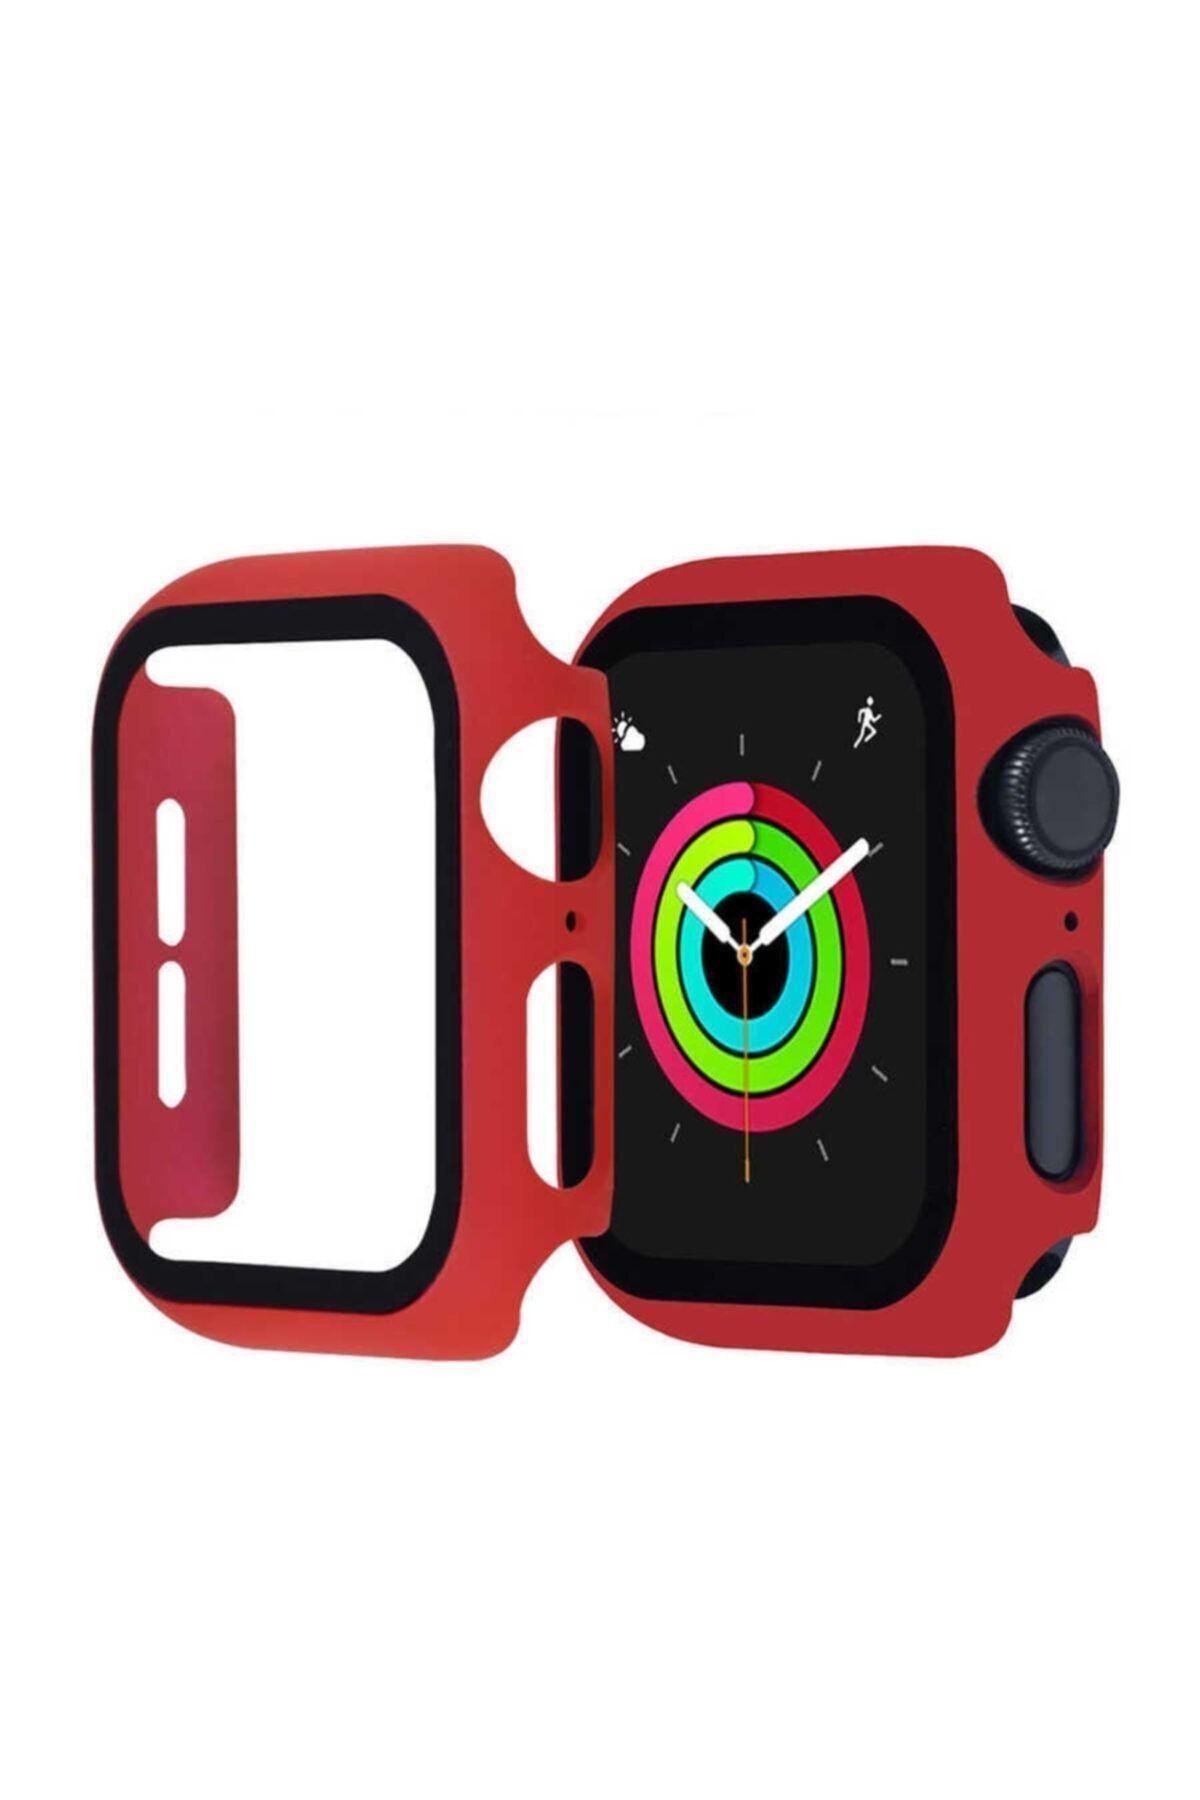 KVK PRİVACY Apple Watch Kırmızı Silikon Kılıf 42mm Tam Koruma Apple Watch 1 2 3 4 5 6 Se 1